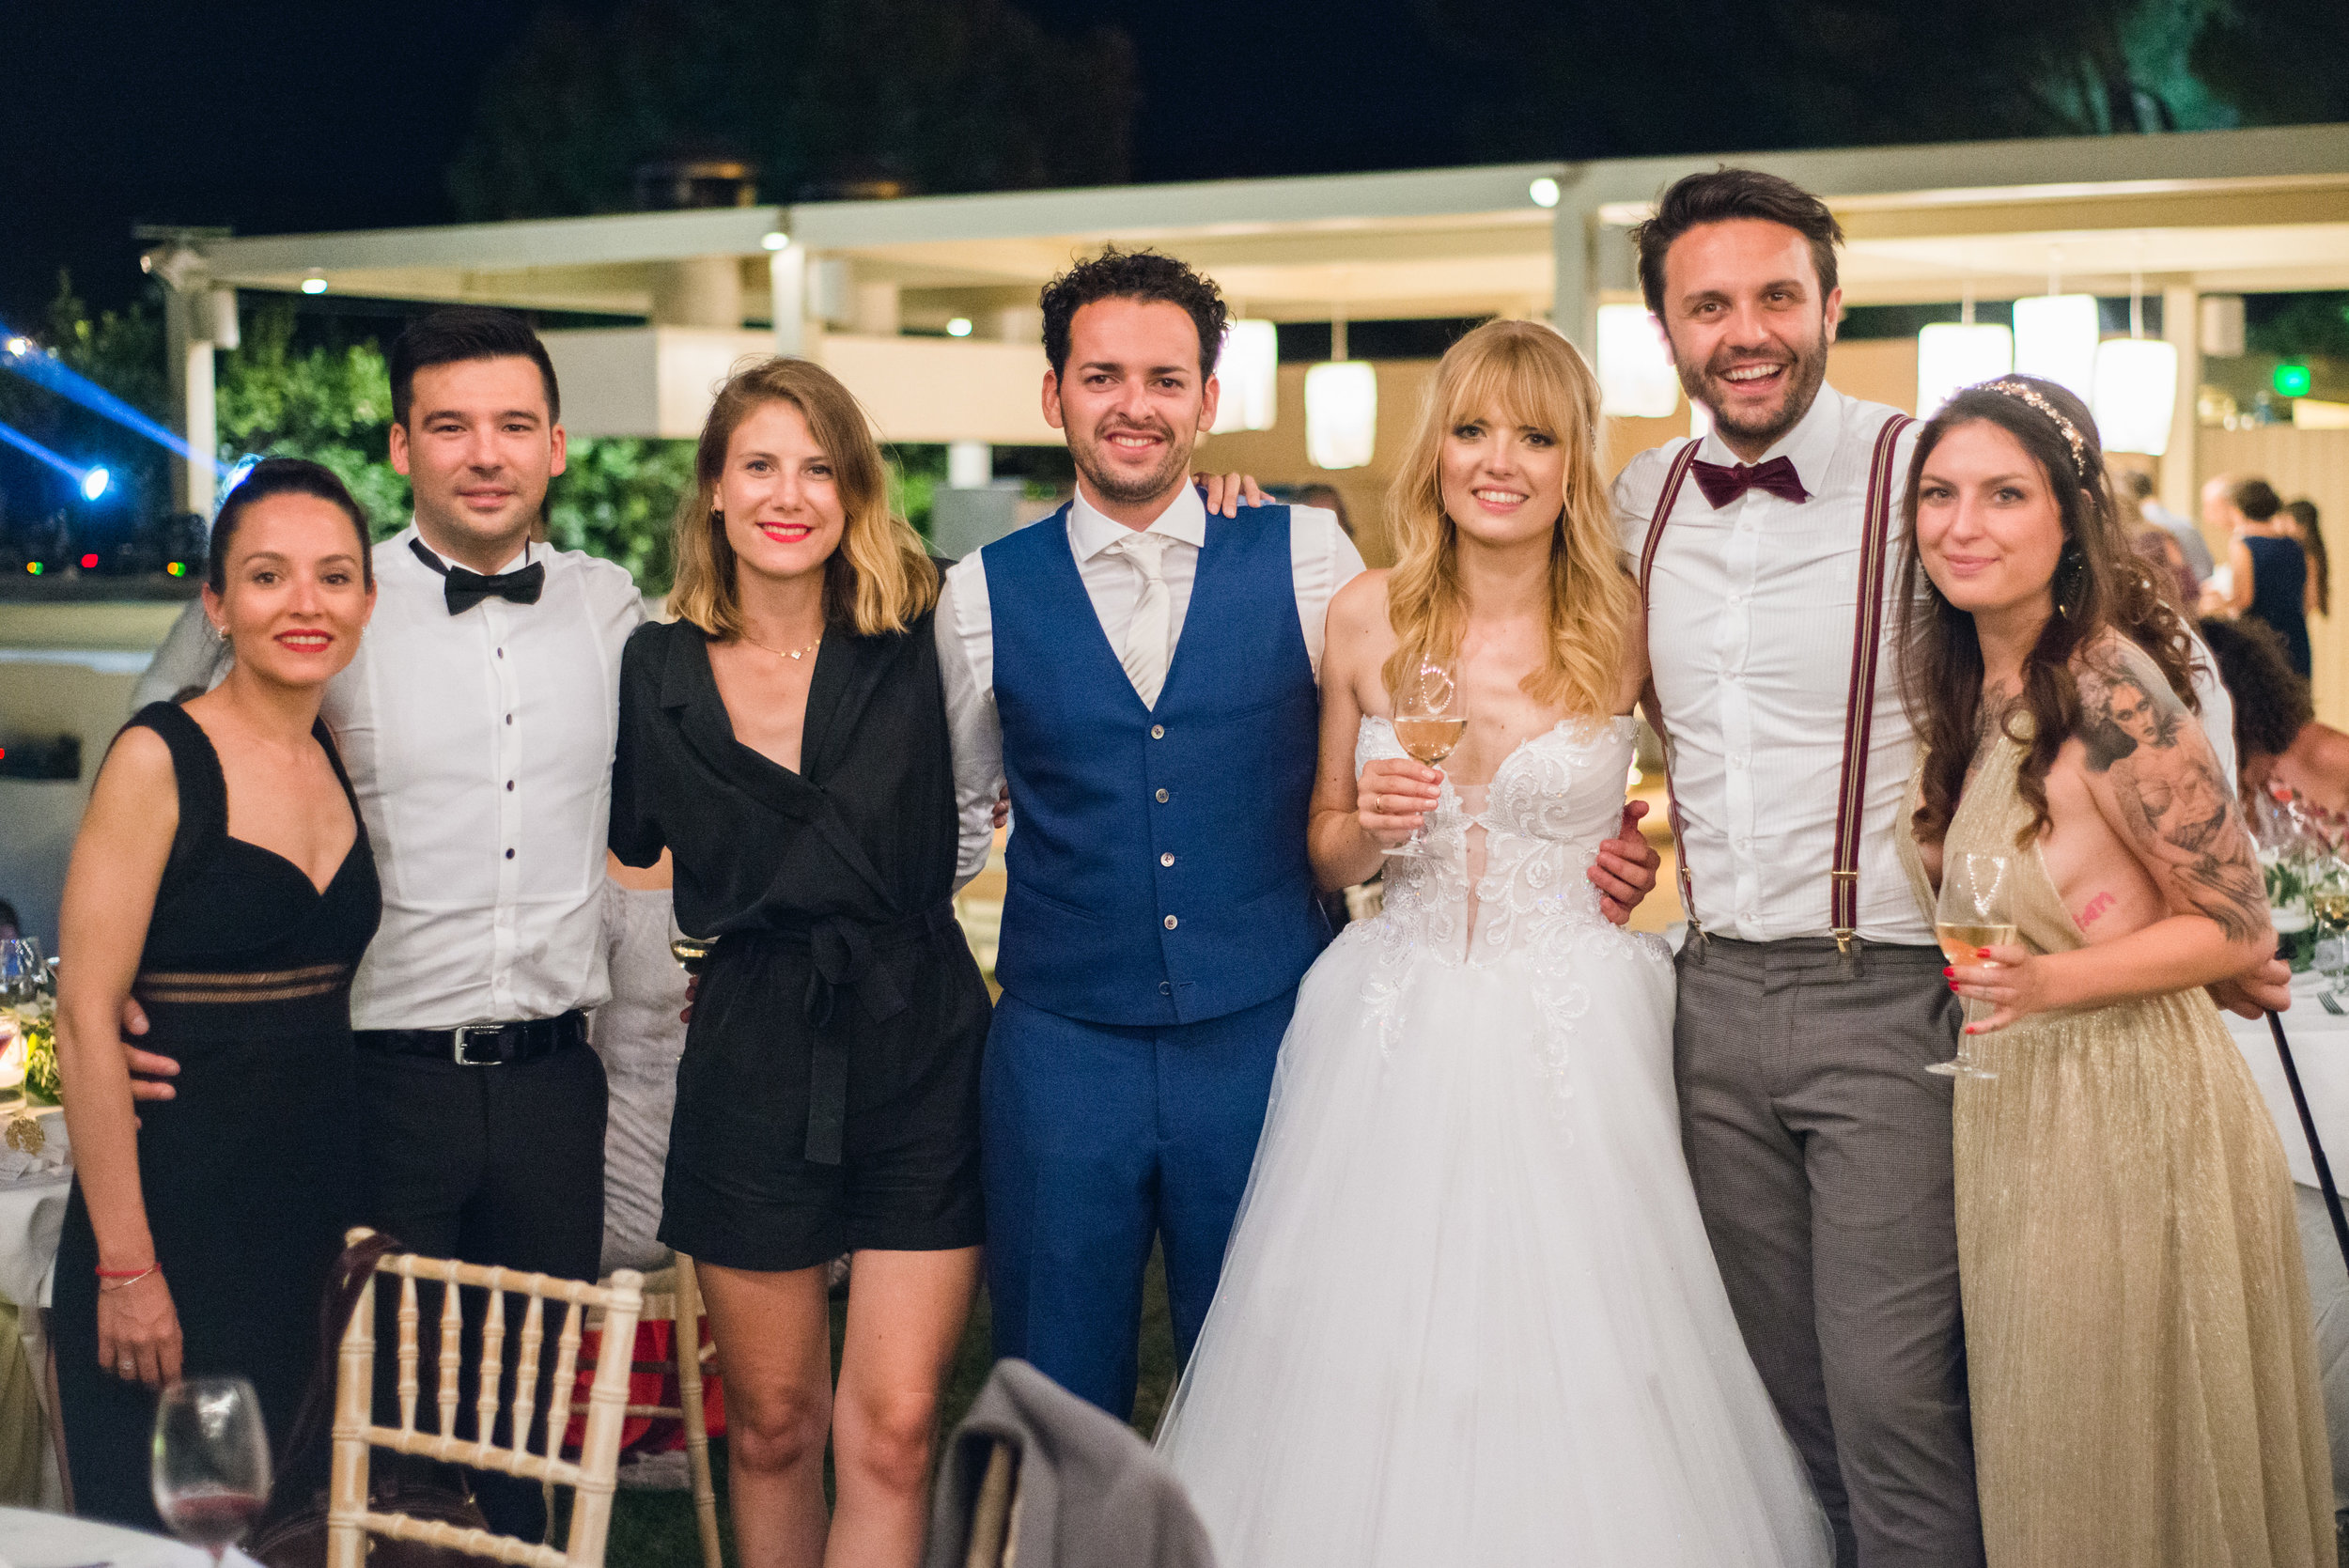 Wedtime_Stories_-_Nikolaos__Stefanie_-_Reception-177.jpg